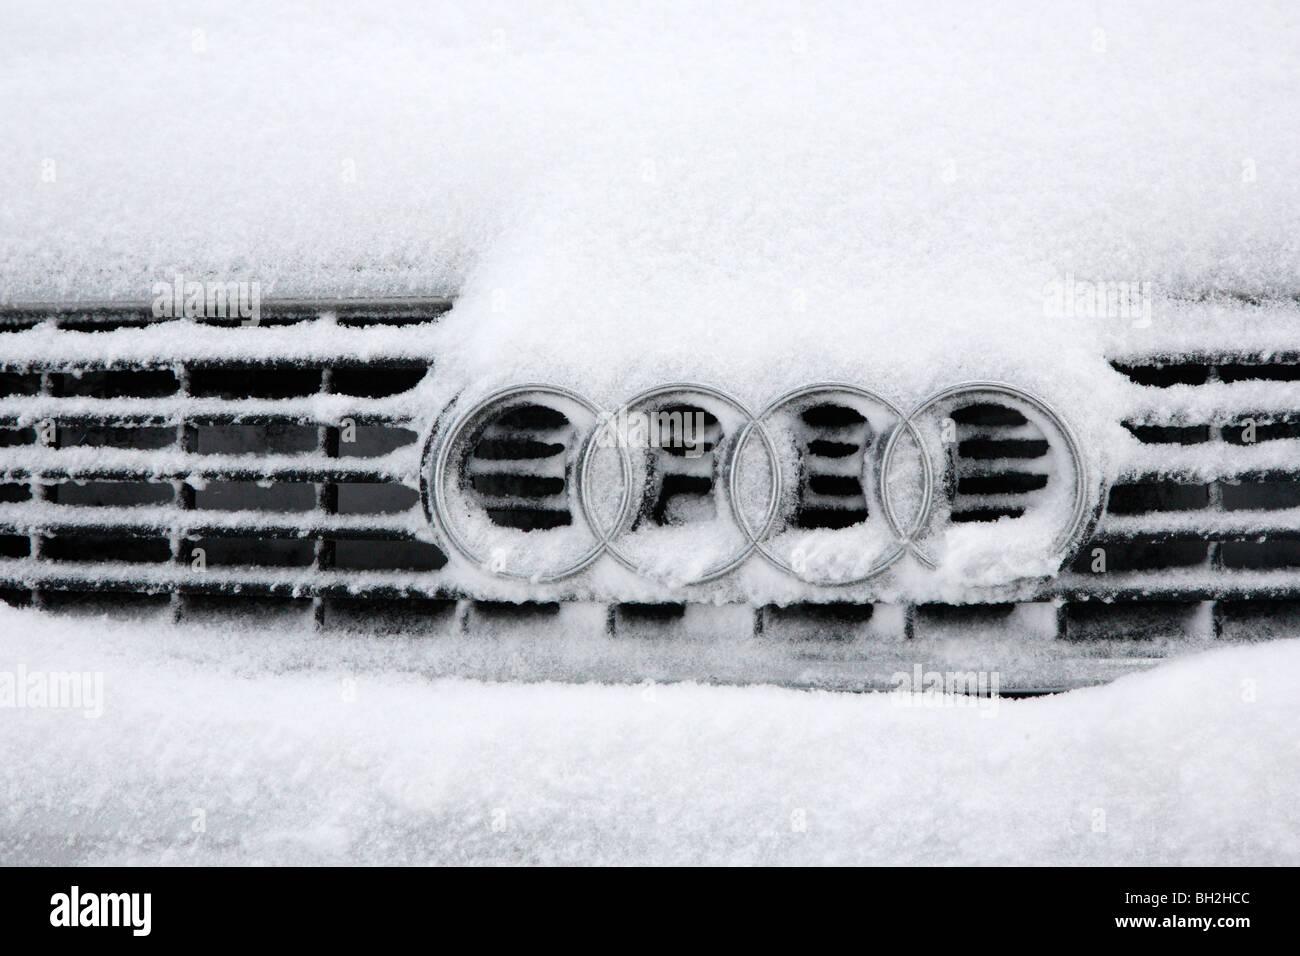 Snowed-In Car, Ystradfellte, Brecon Beacons, Wales, UK - Stock Image